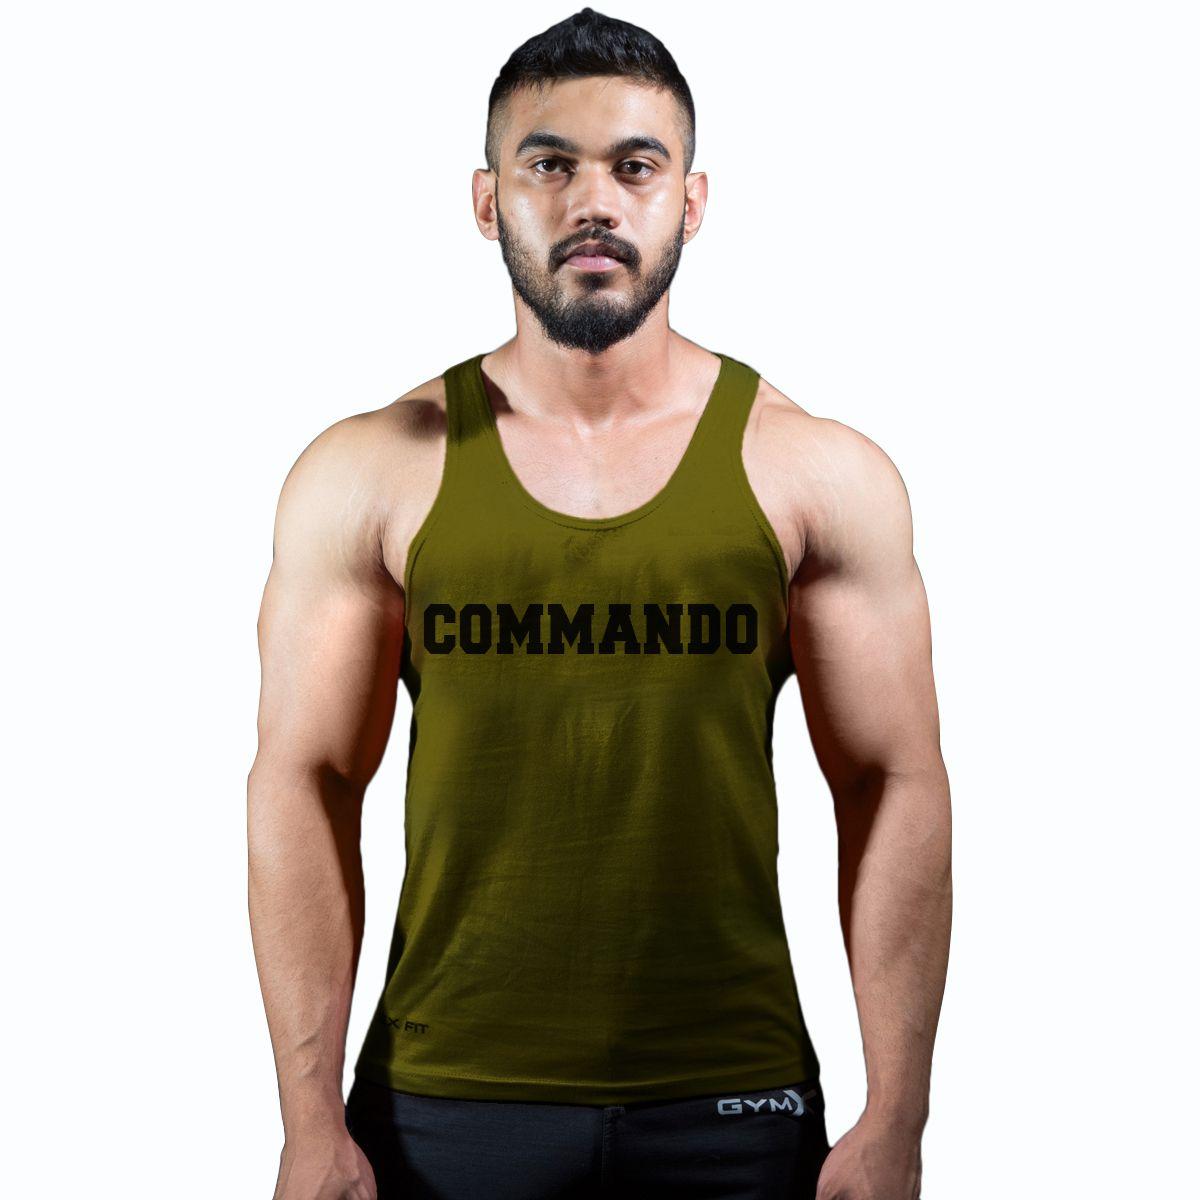 GymX Mens Cotton Commando Military Green- Classic Stringer